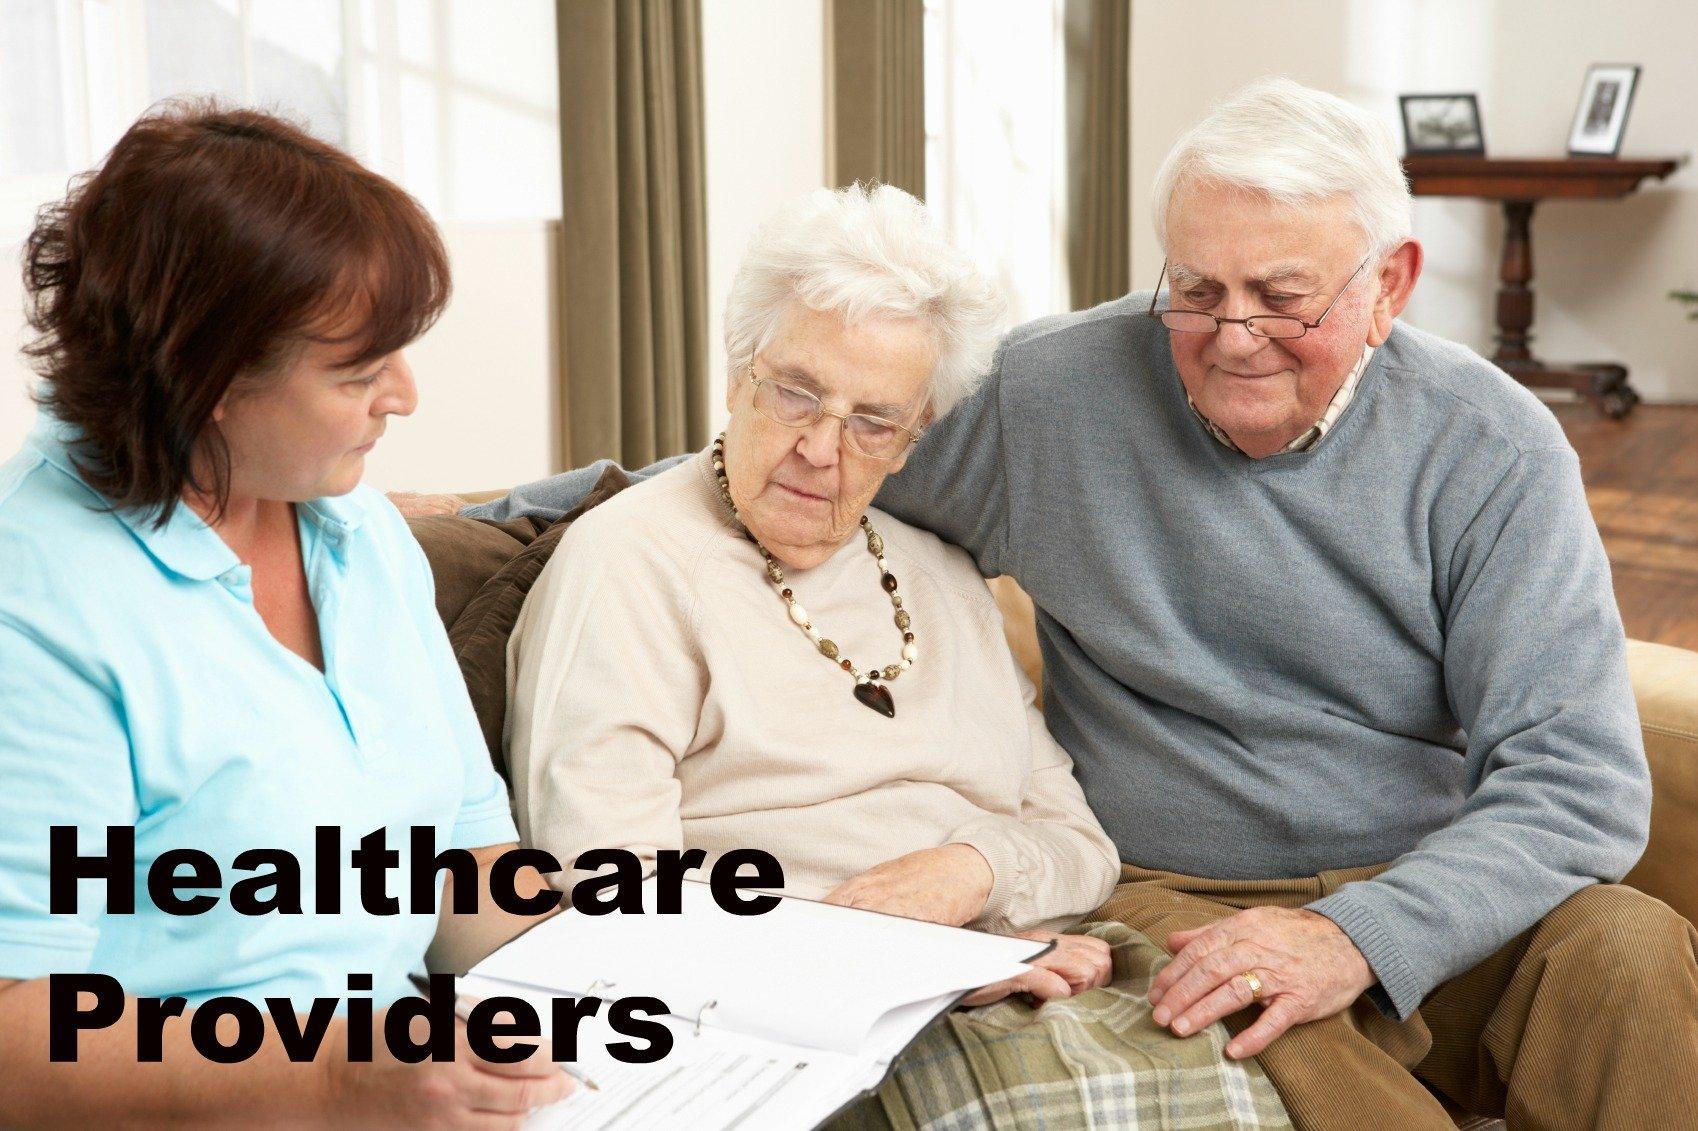 Healthcare_providers_2.jpg